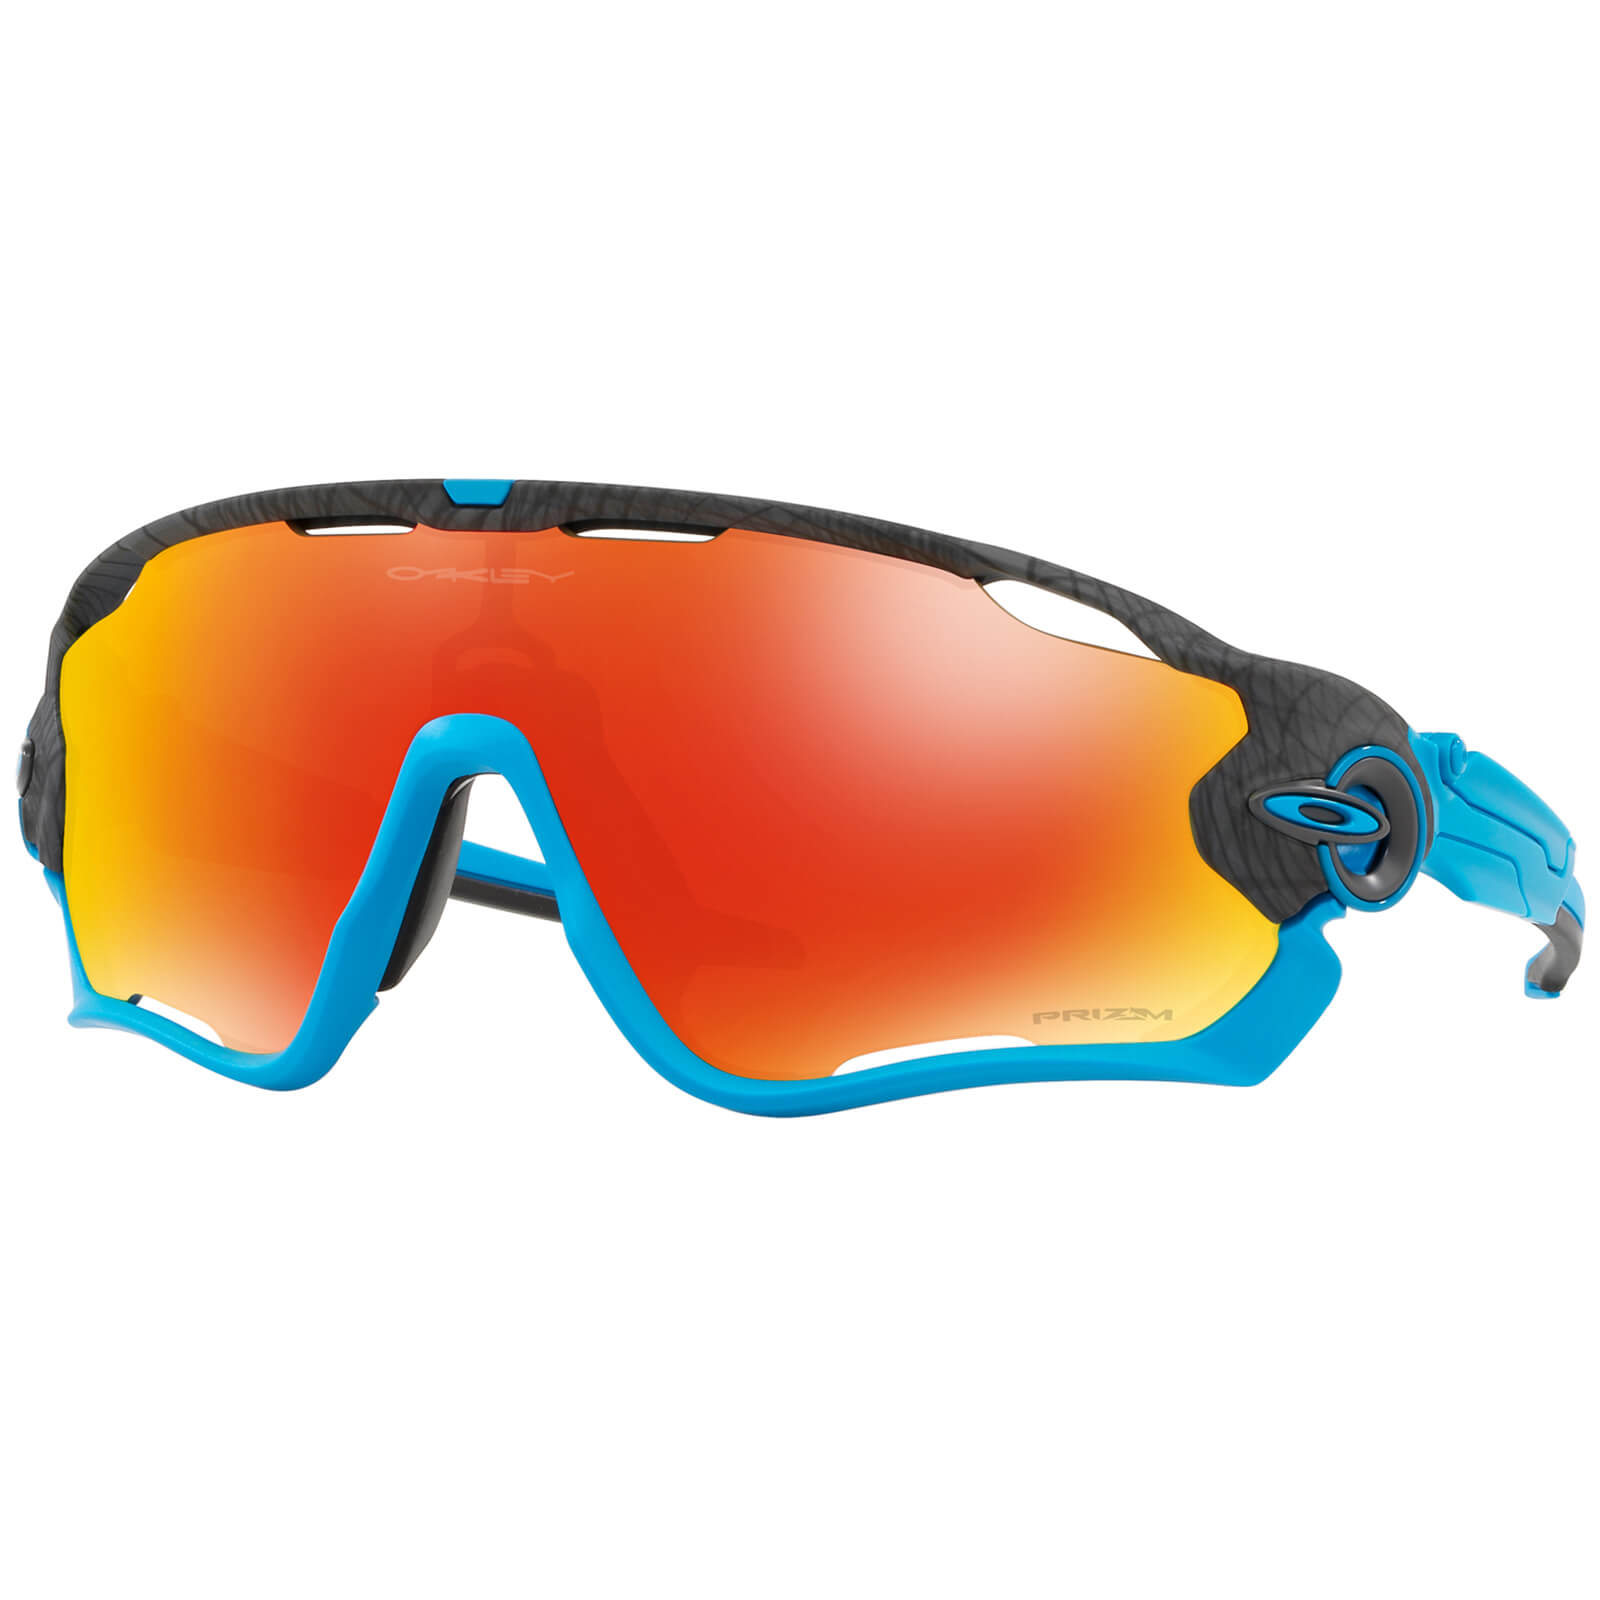 3e0d78c2755 Oakley Jawbreaker Sunglasses - Aero Grid Grey Prizm Ruby ...